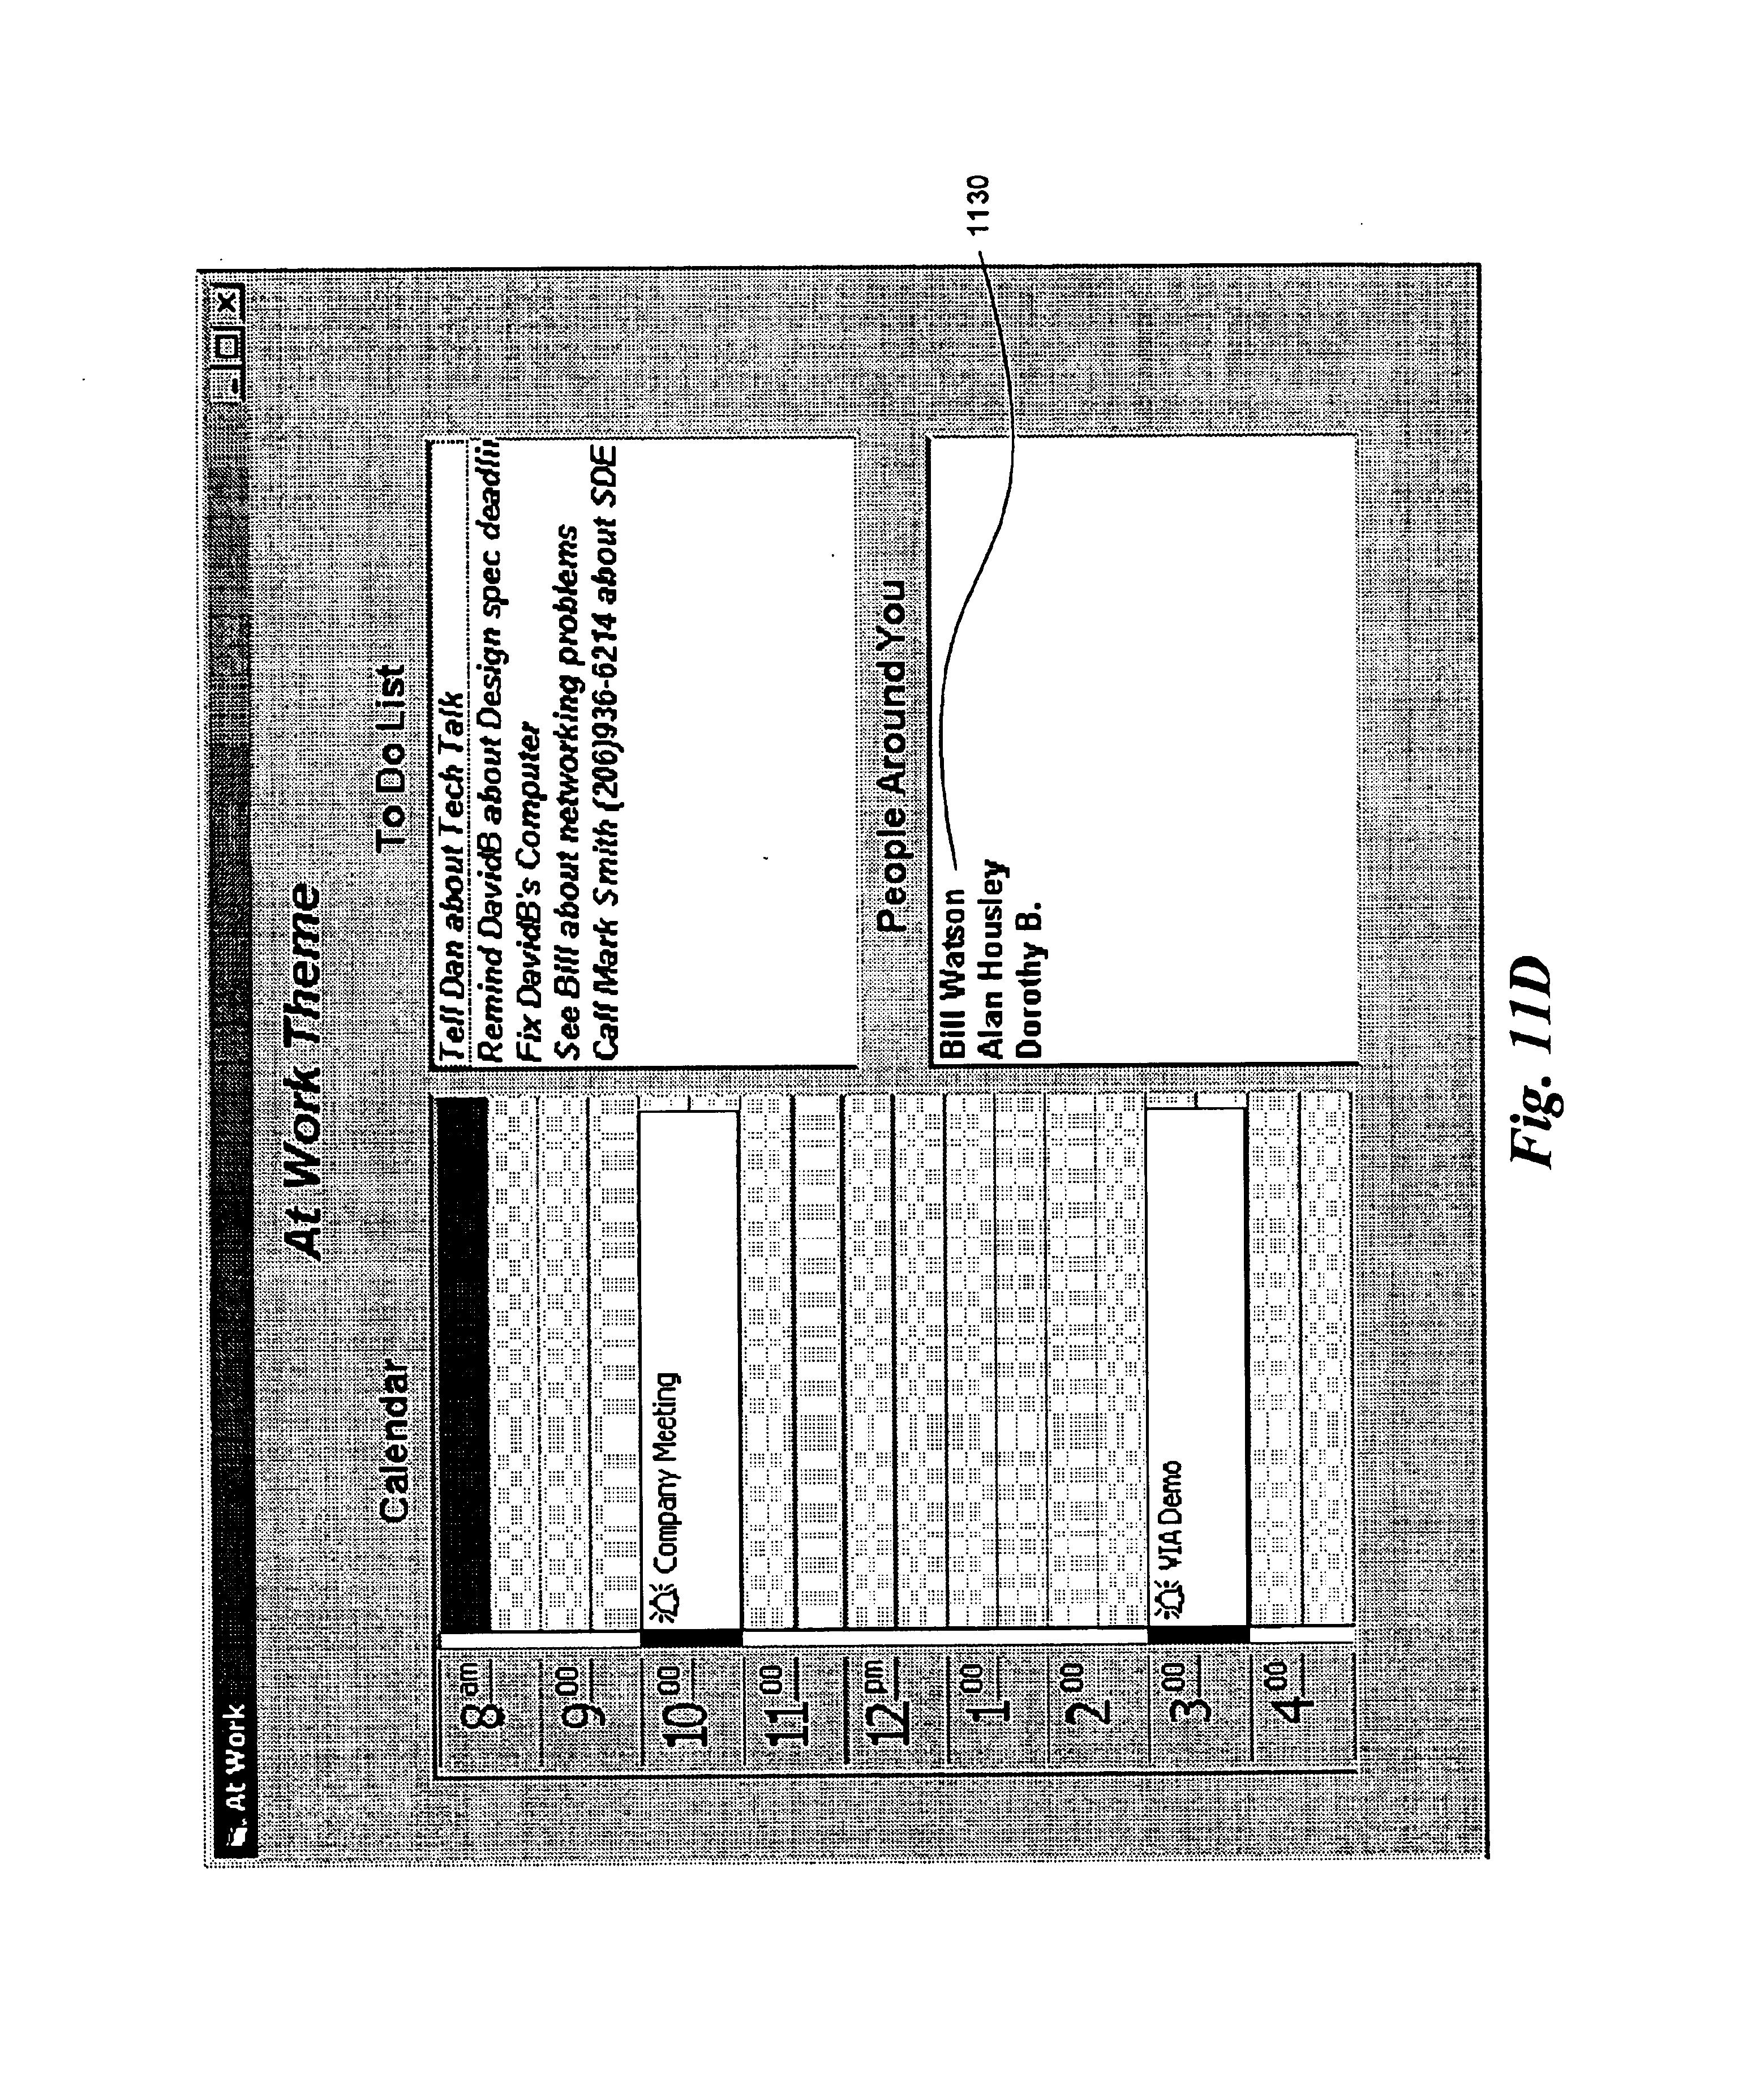 Patent Us 6842877 B2 Basic Tachometer Circuit Using An Ir Led Receiver Couple